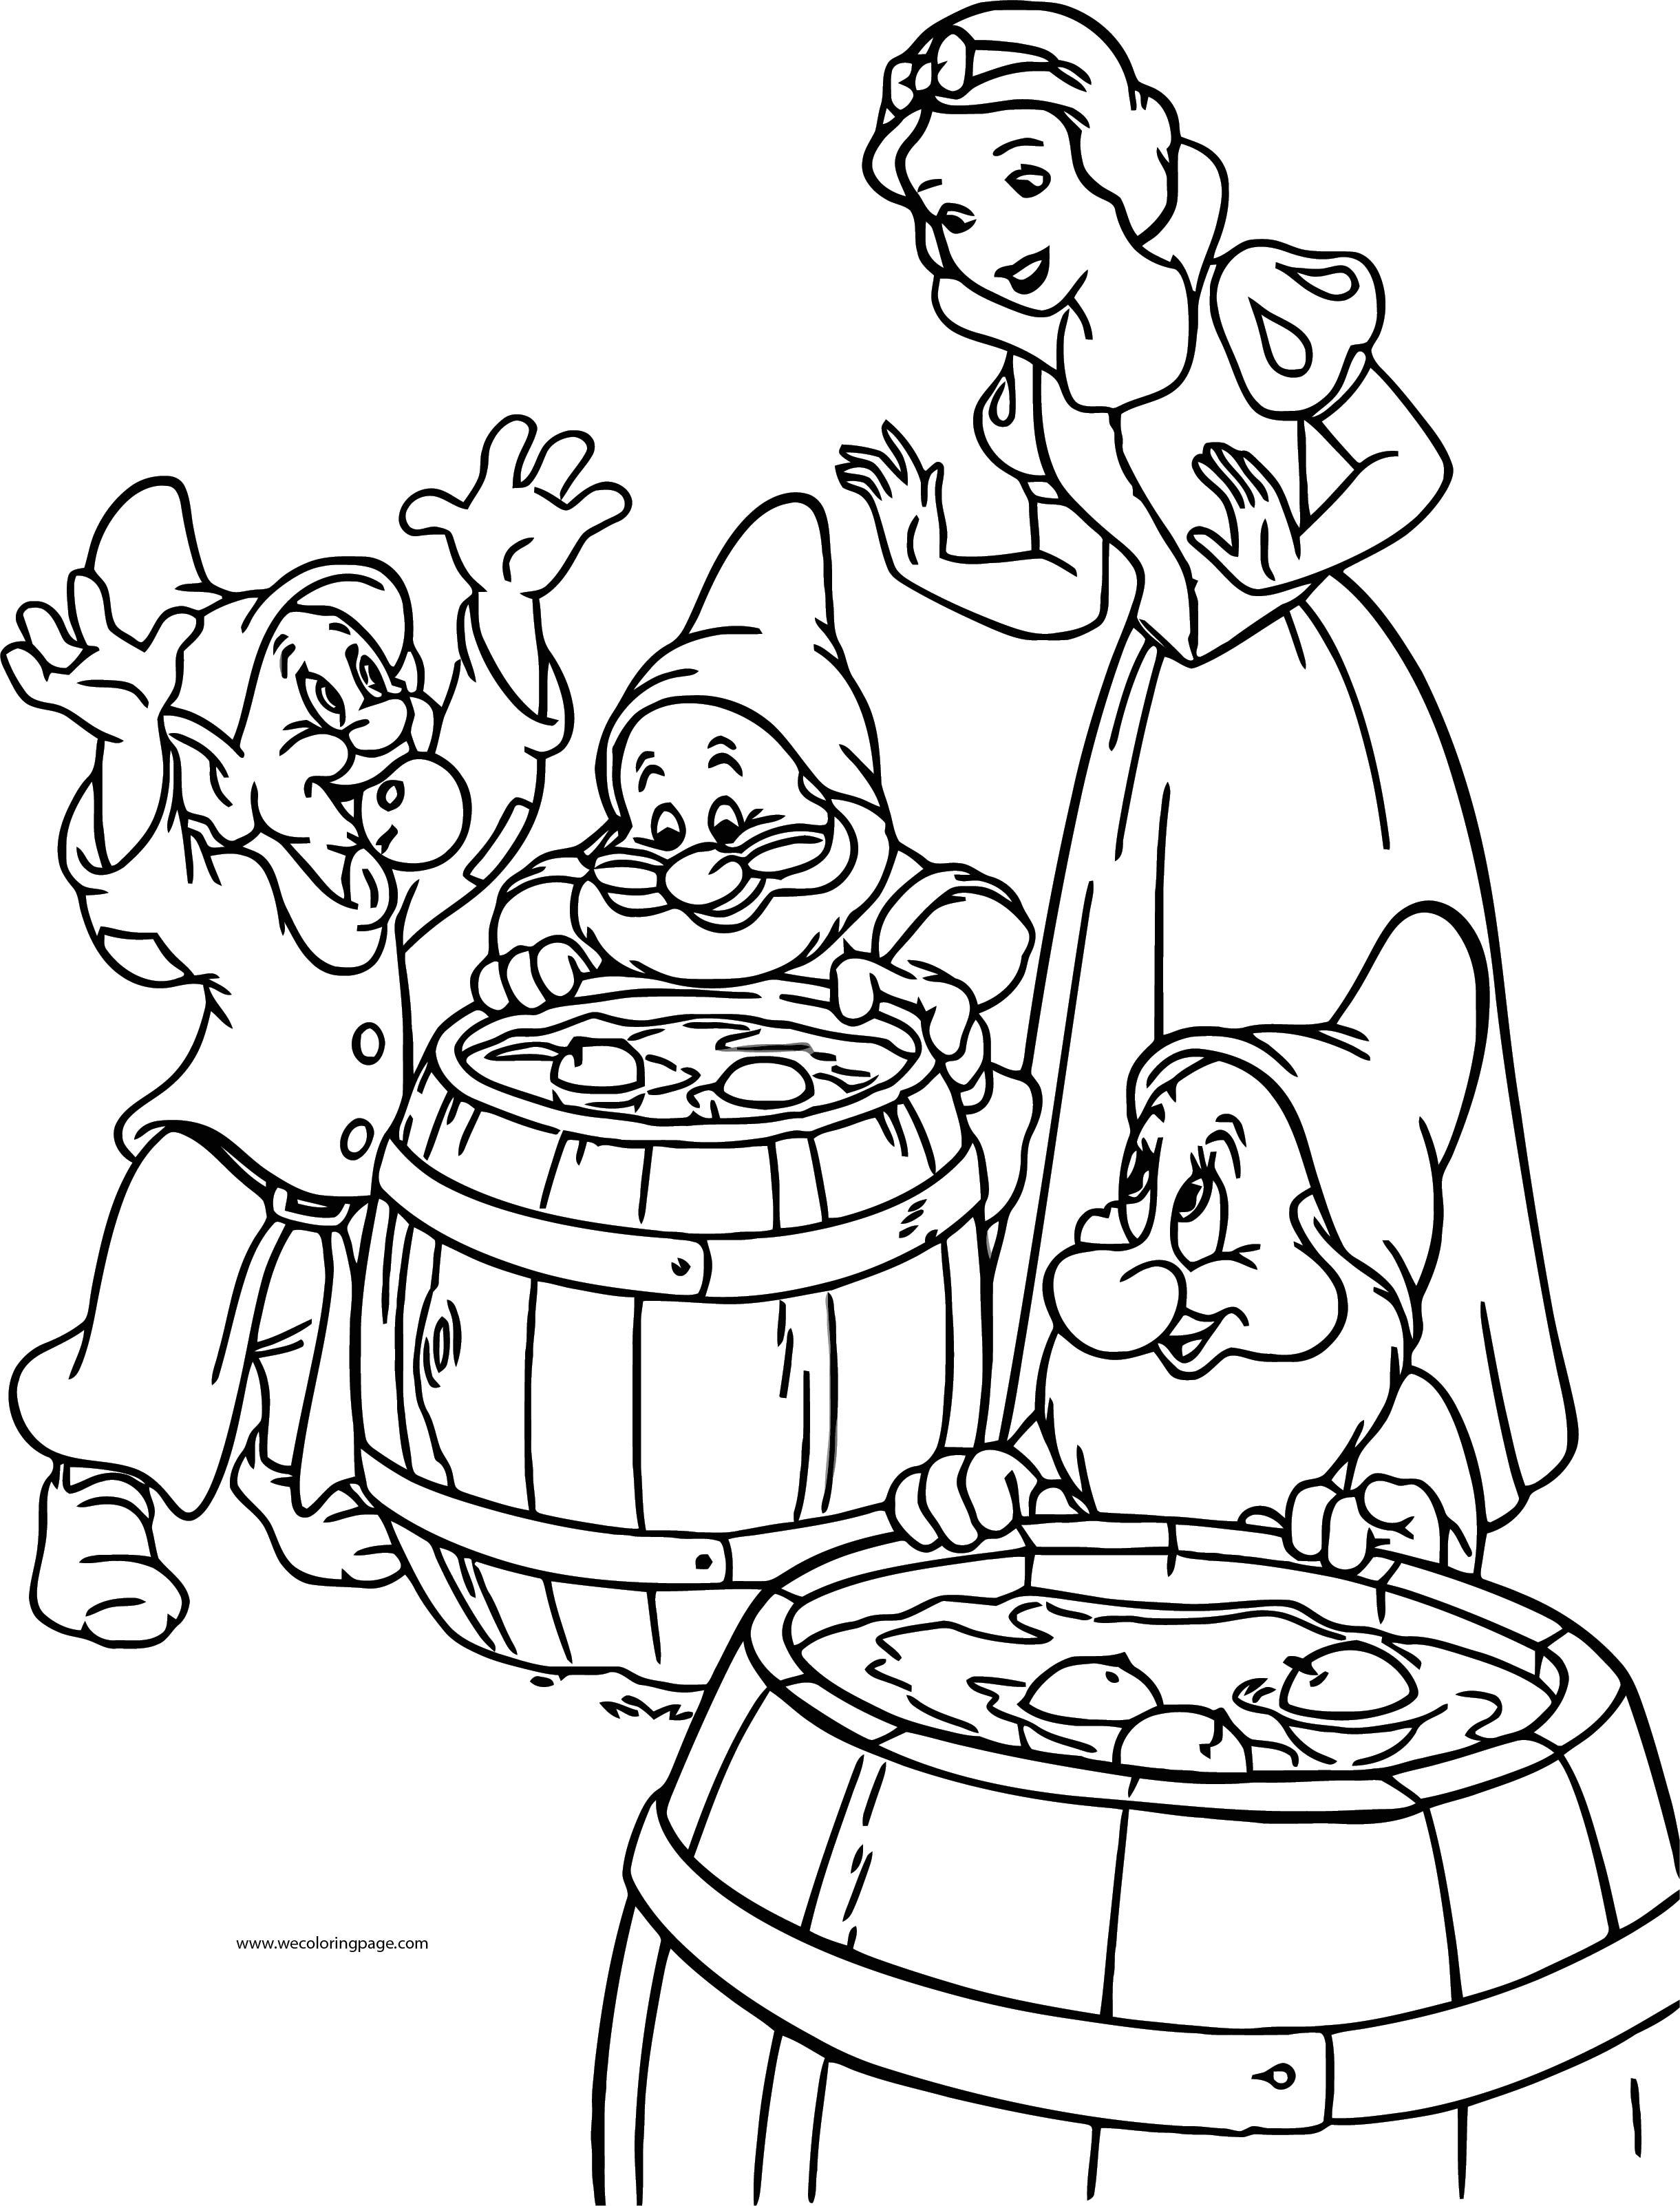 Snow White The Seven Dwarfs Coloring Page 24